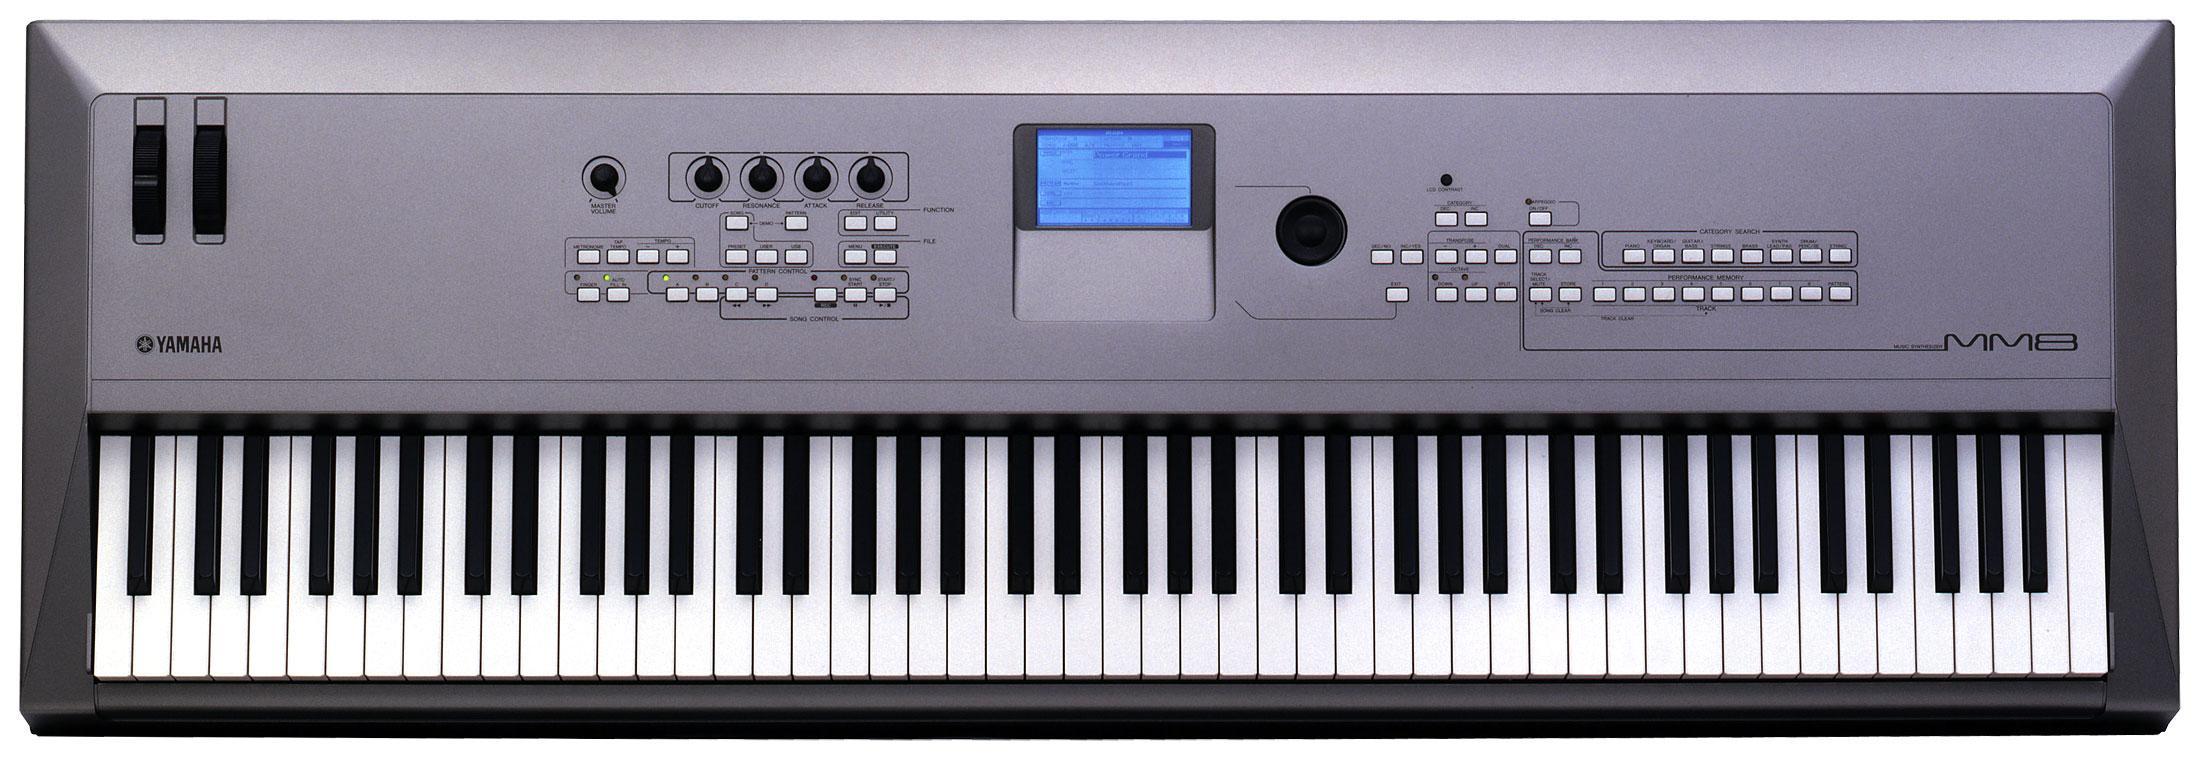 pro keyboards professional keyboards and pianos yamaha roland korg moog. Black Bedroom Furniture Sets. Home Design Ideas